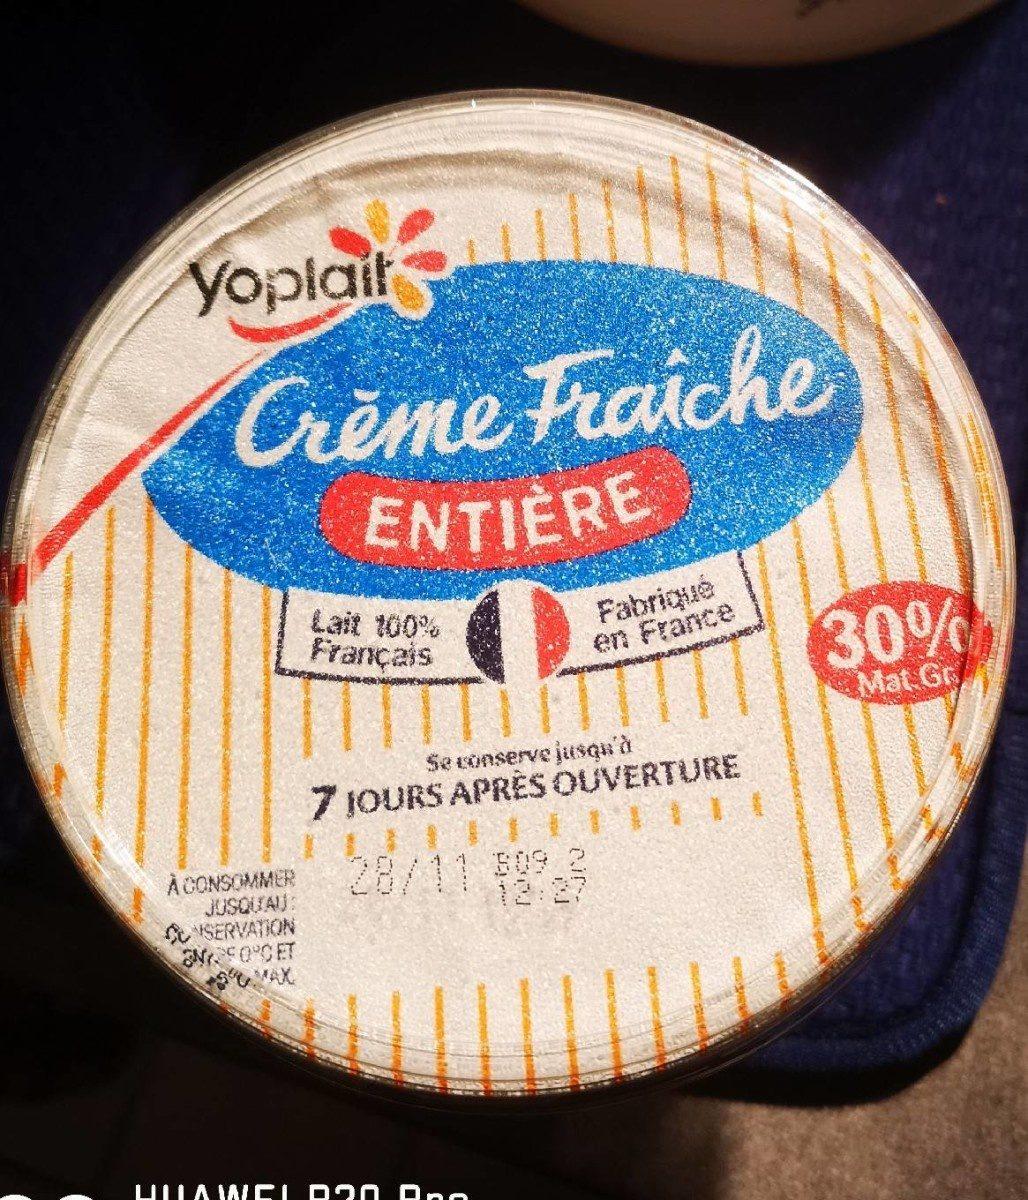 Crème fraiche - Product